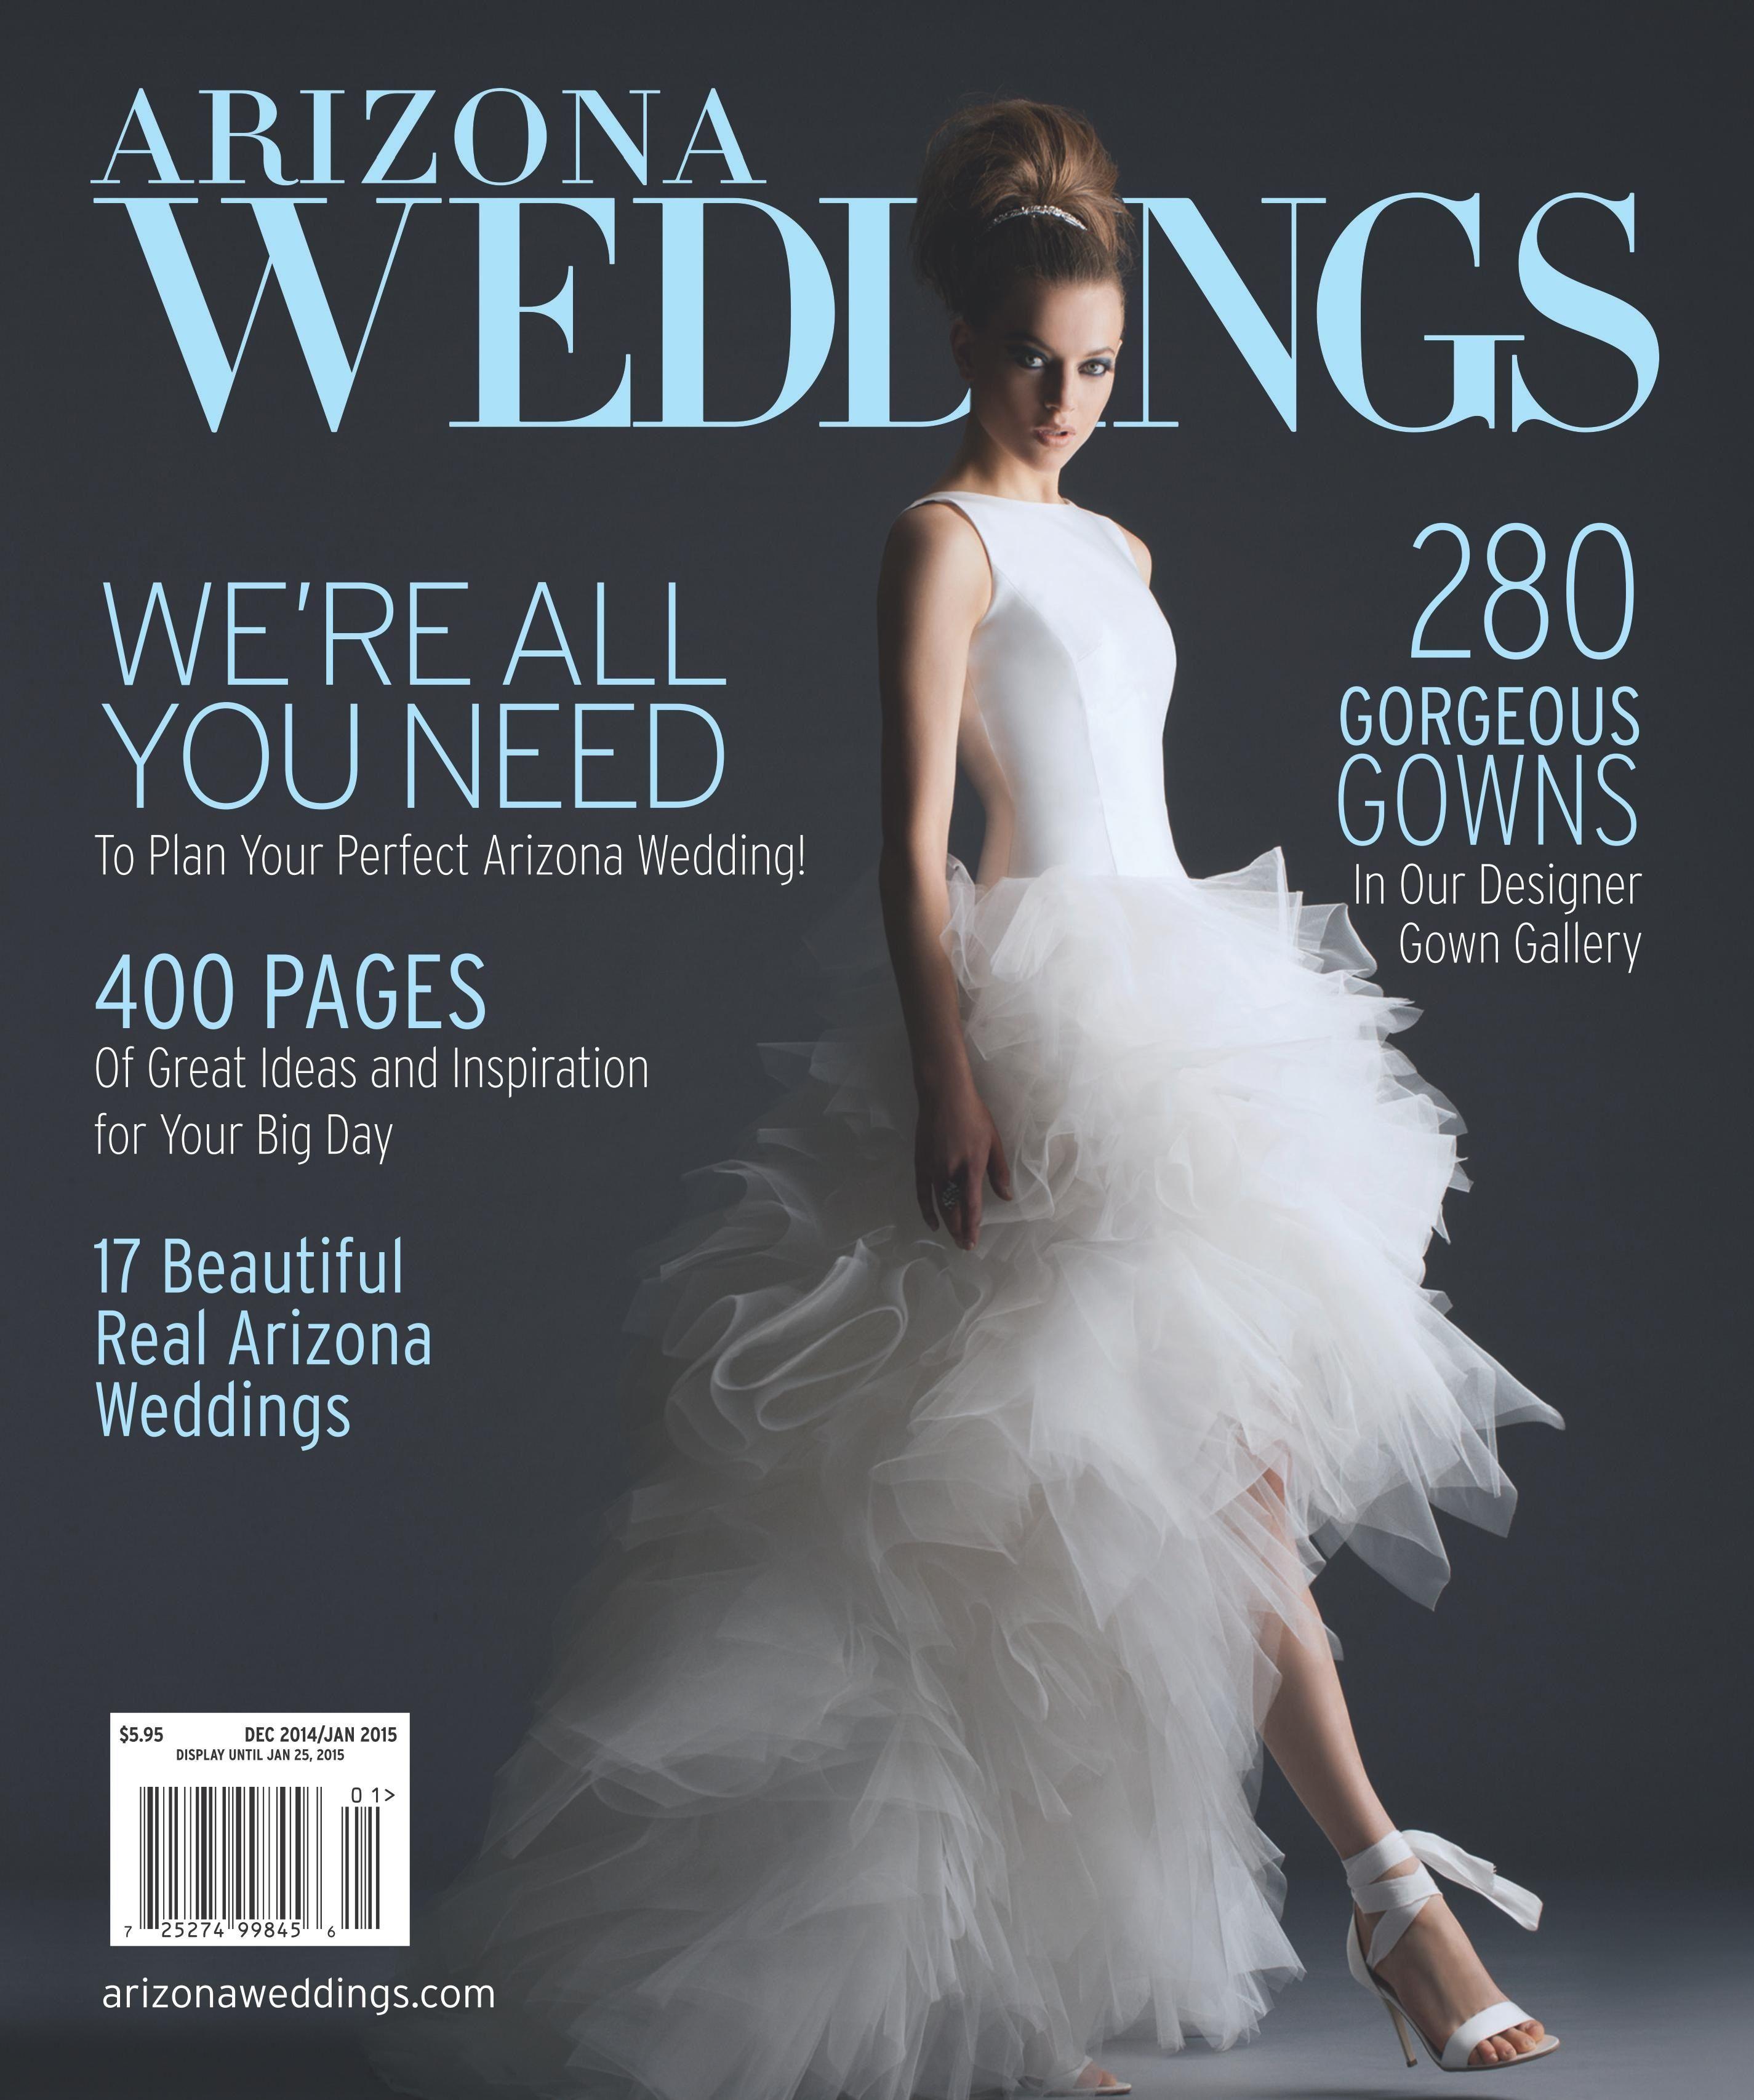 Arizona Weddings Magazine 2014/2015 December/January Cover!